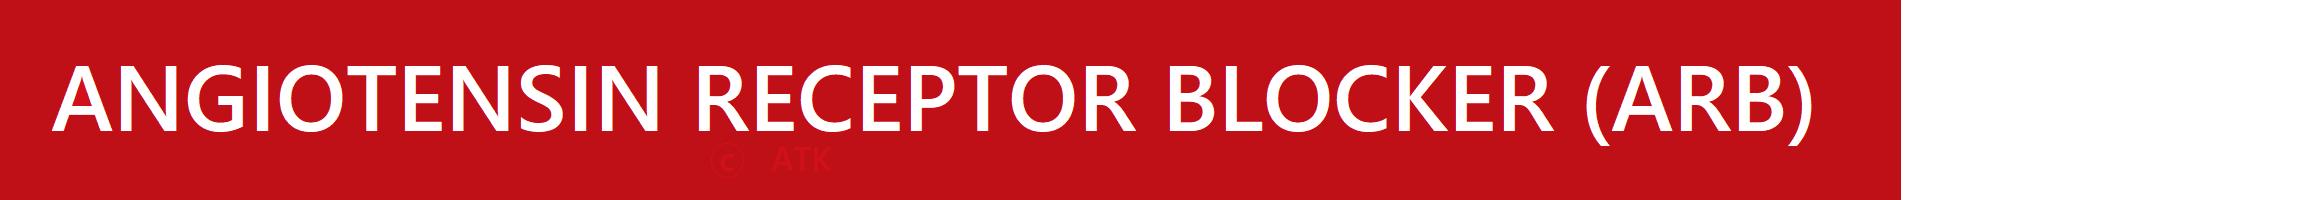 ARB High blood pressure in CKD treatment